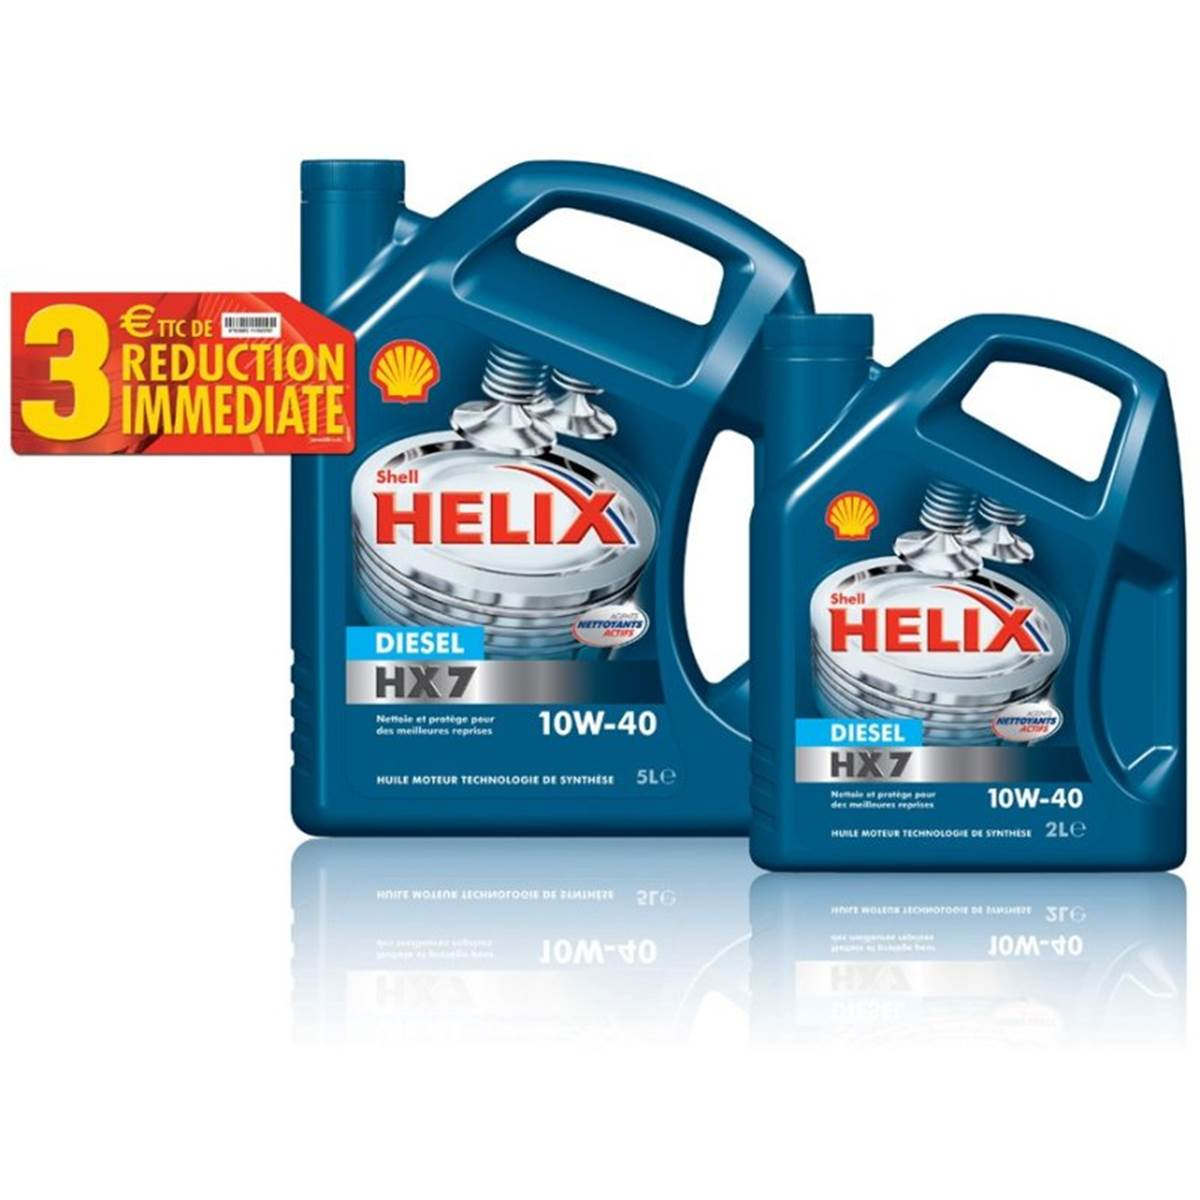 Huile SHELL HX7 essence 10w40 5L + 2L